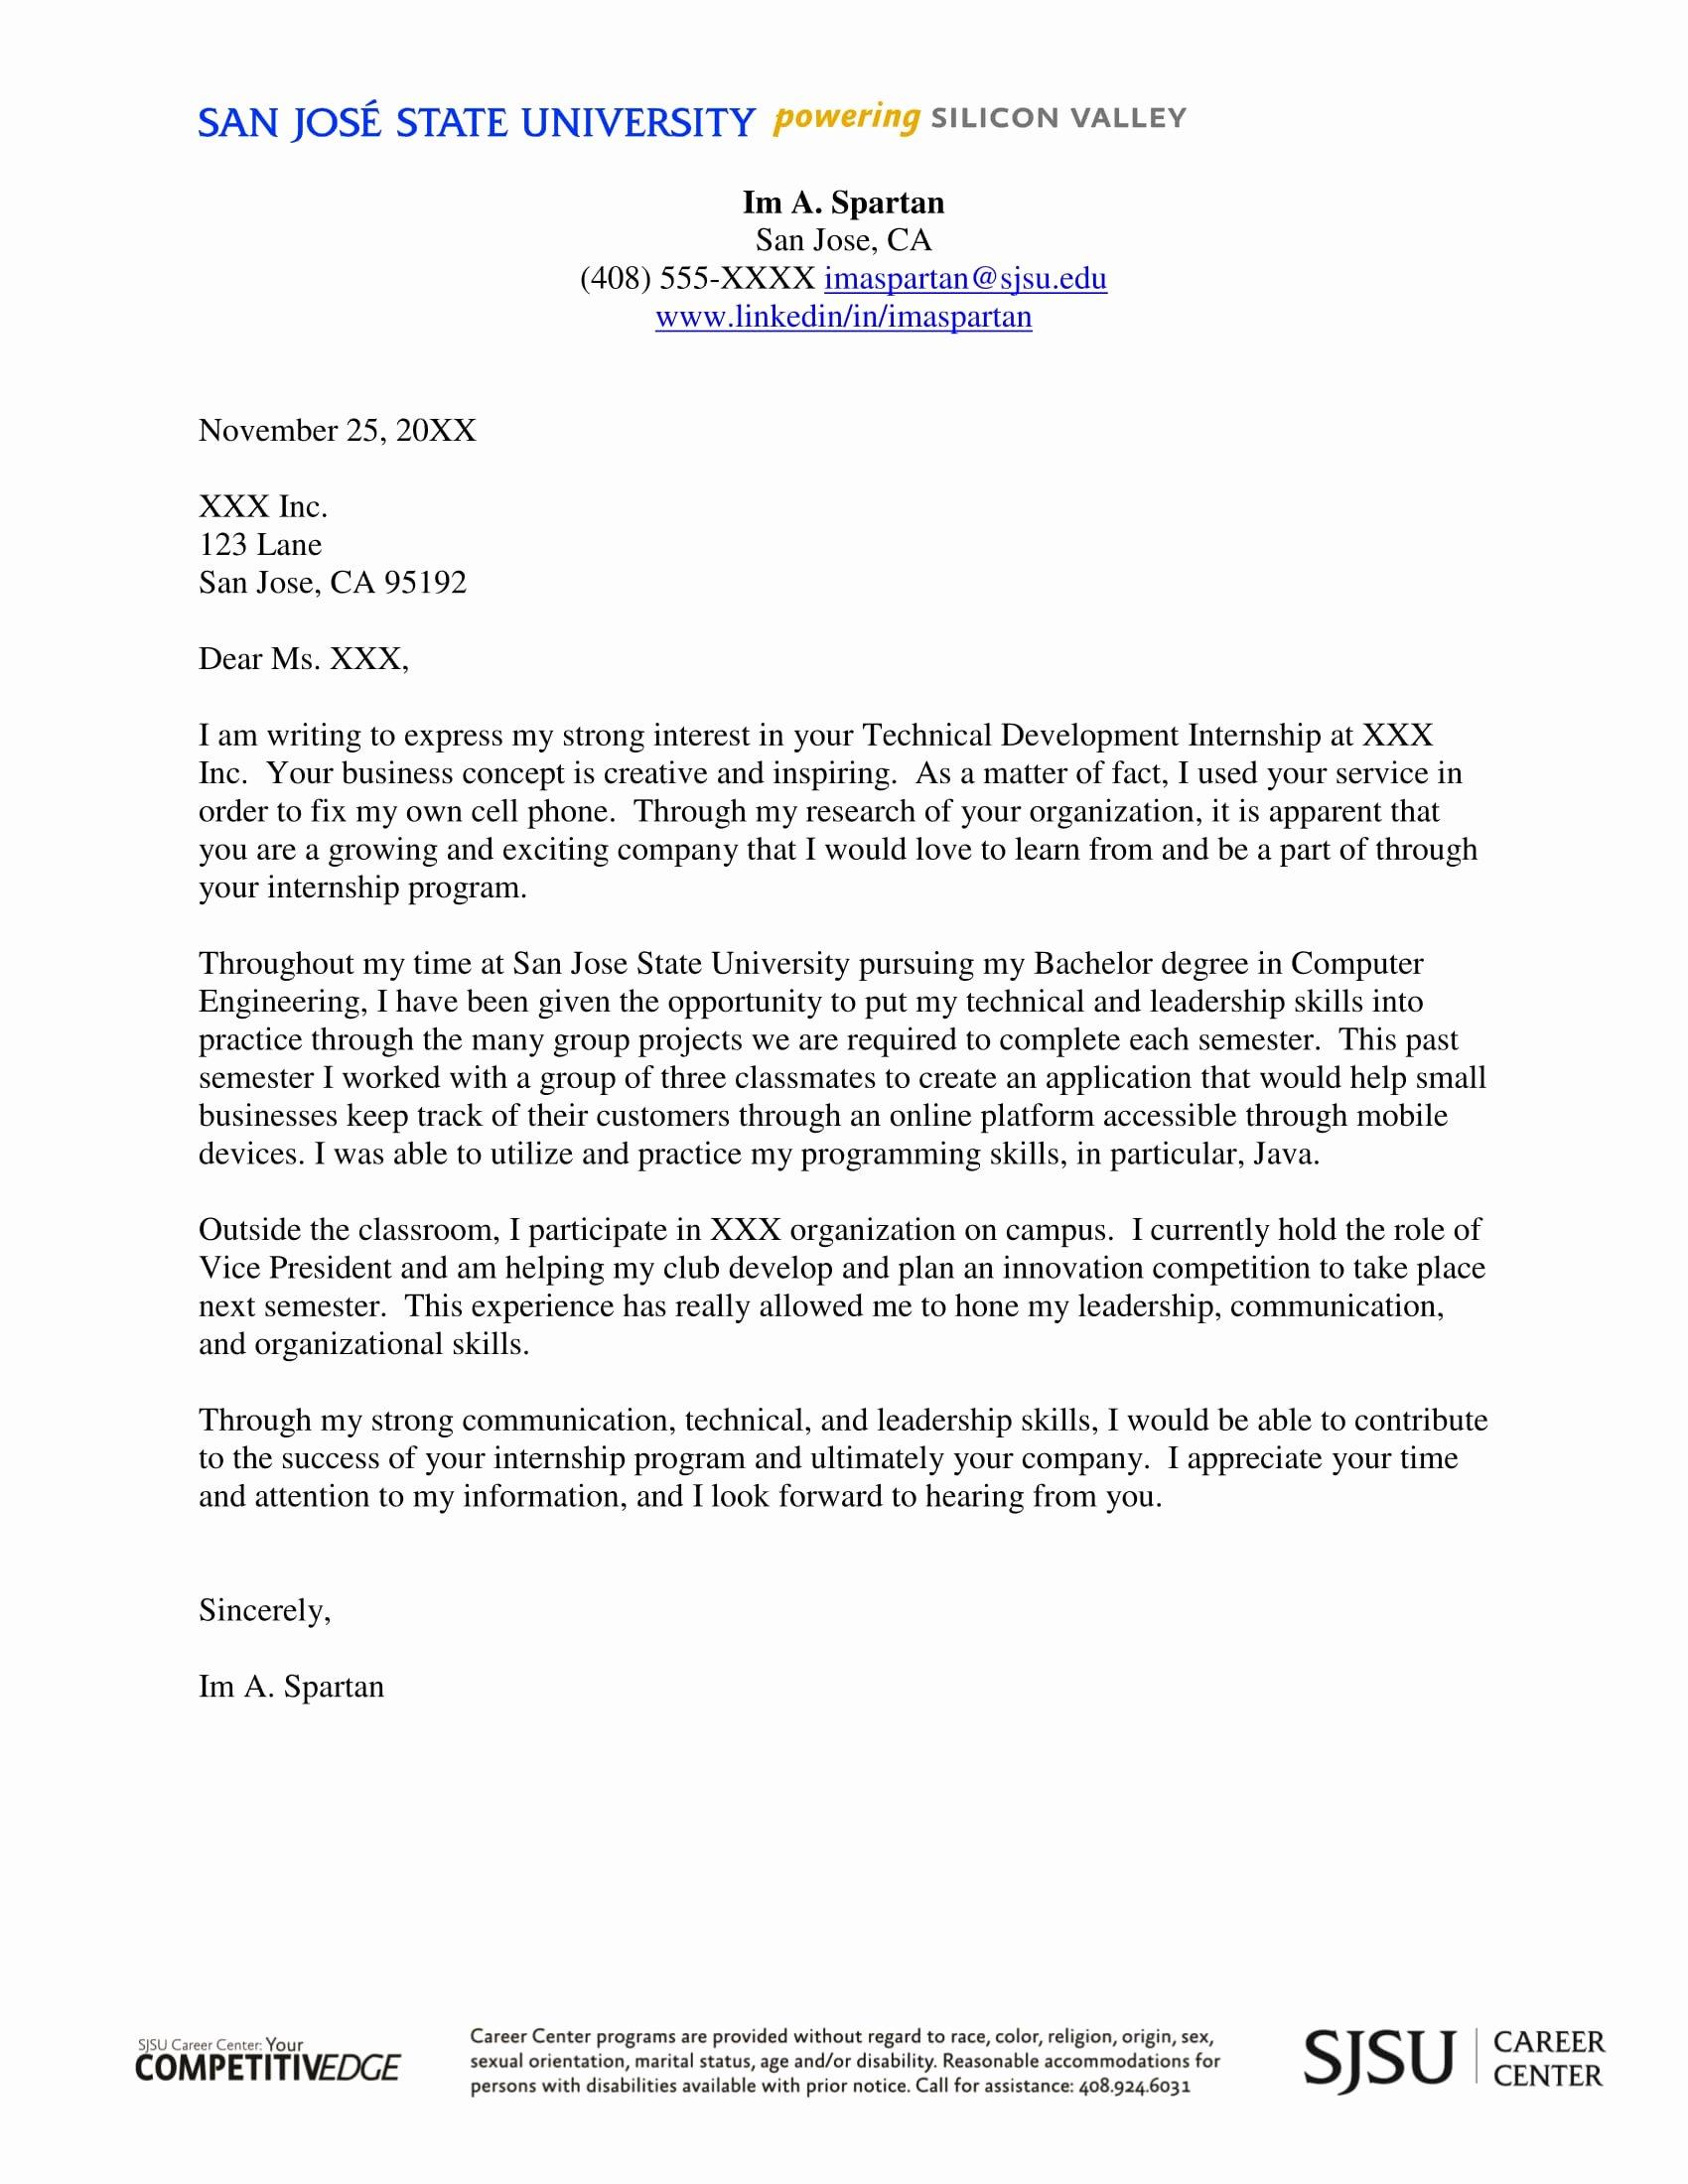 Cover Letter format for Internship Luxury 16 Best Cover Letter Samples for Internship Wisestep